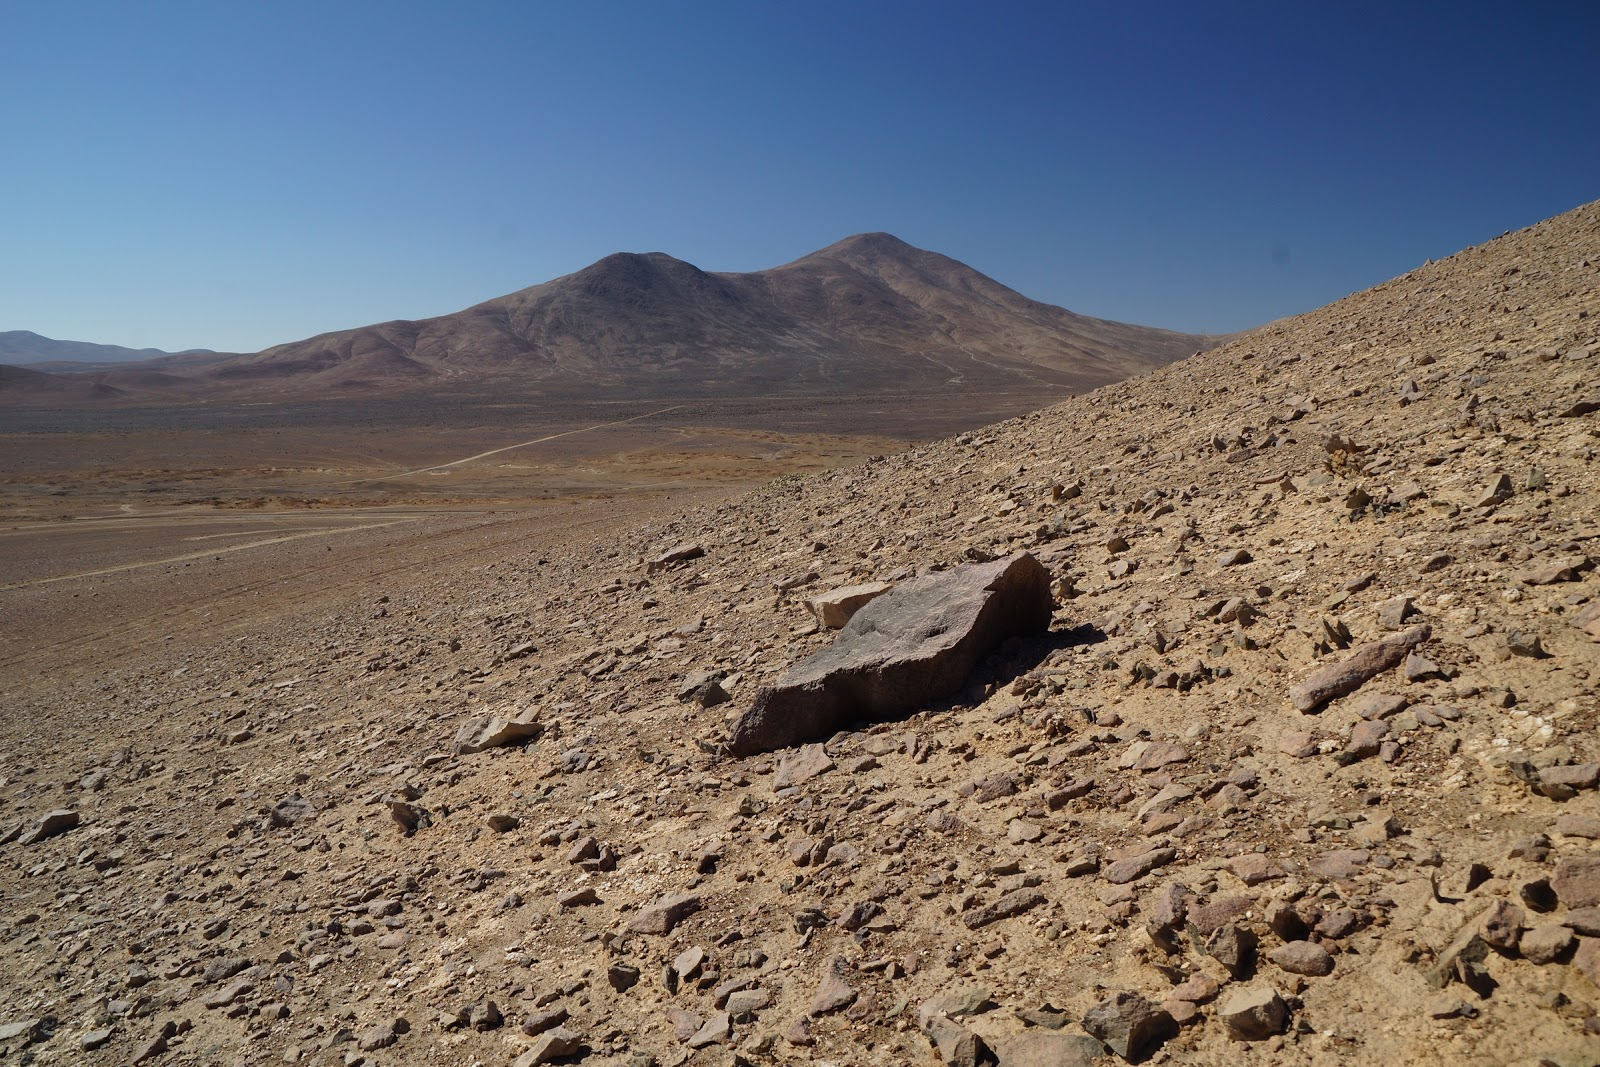 Atacama - One Moon One Sun - Lost Entity